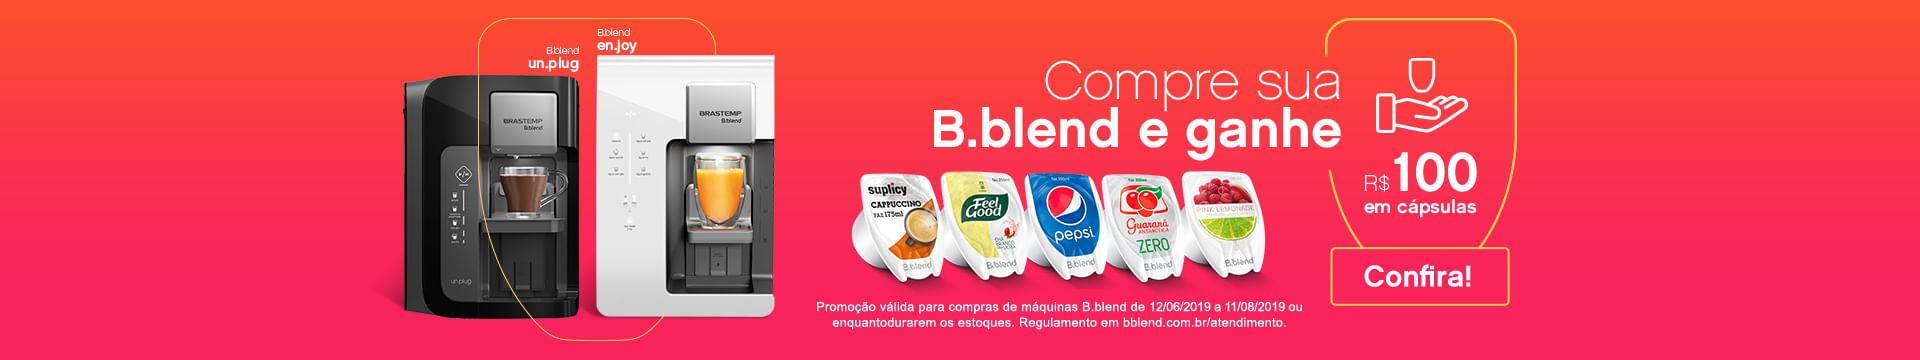 B blend promoção